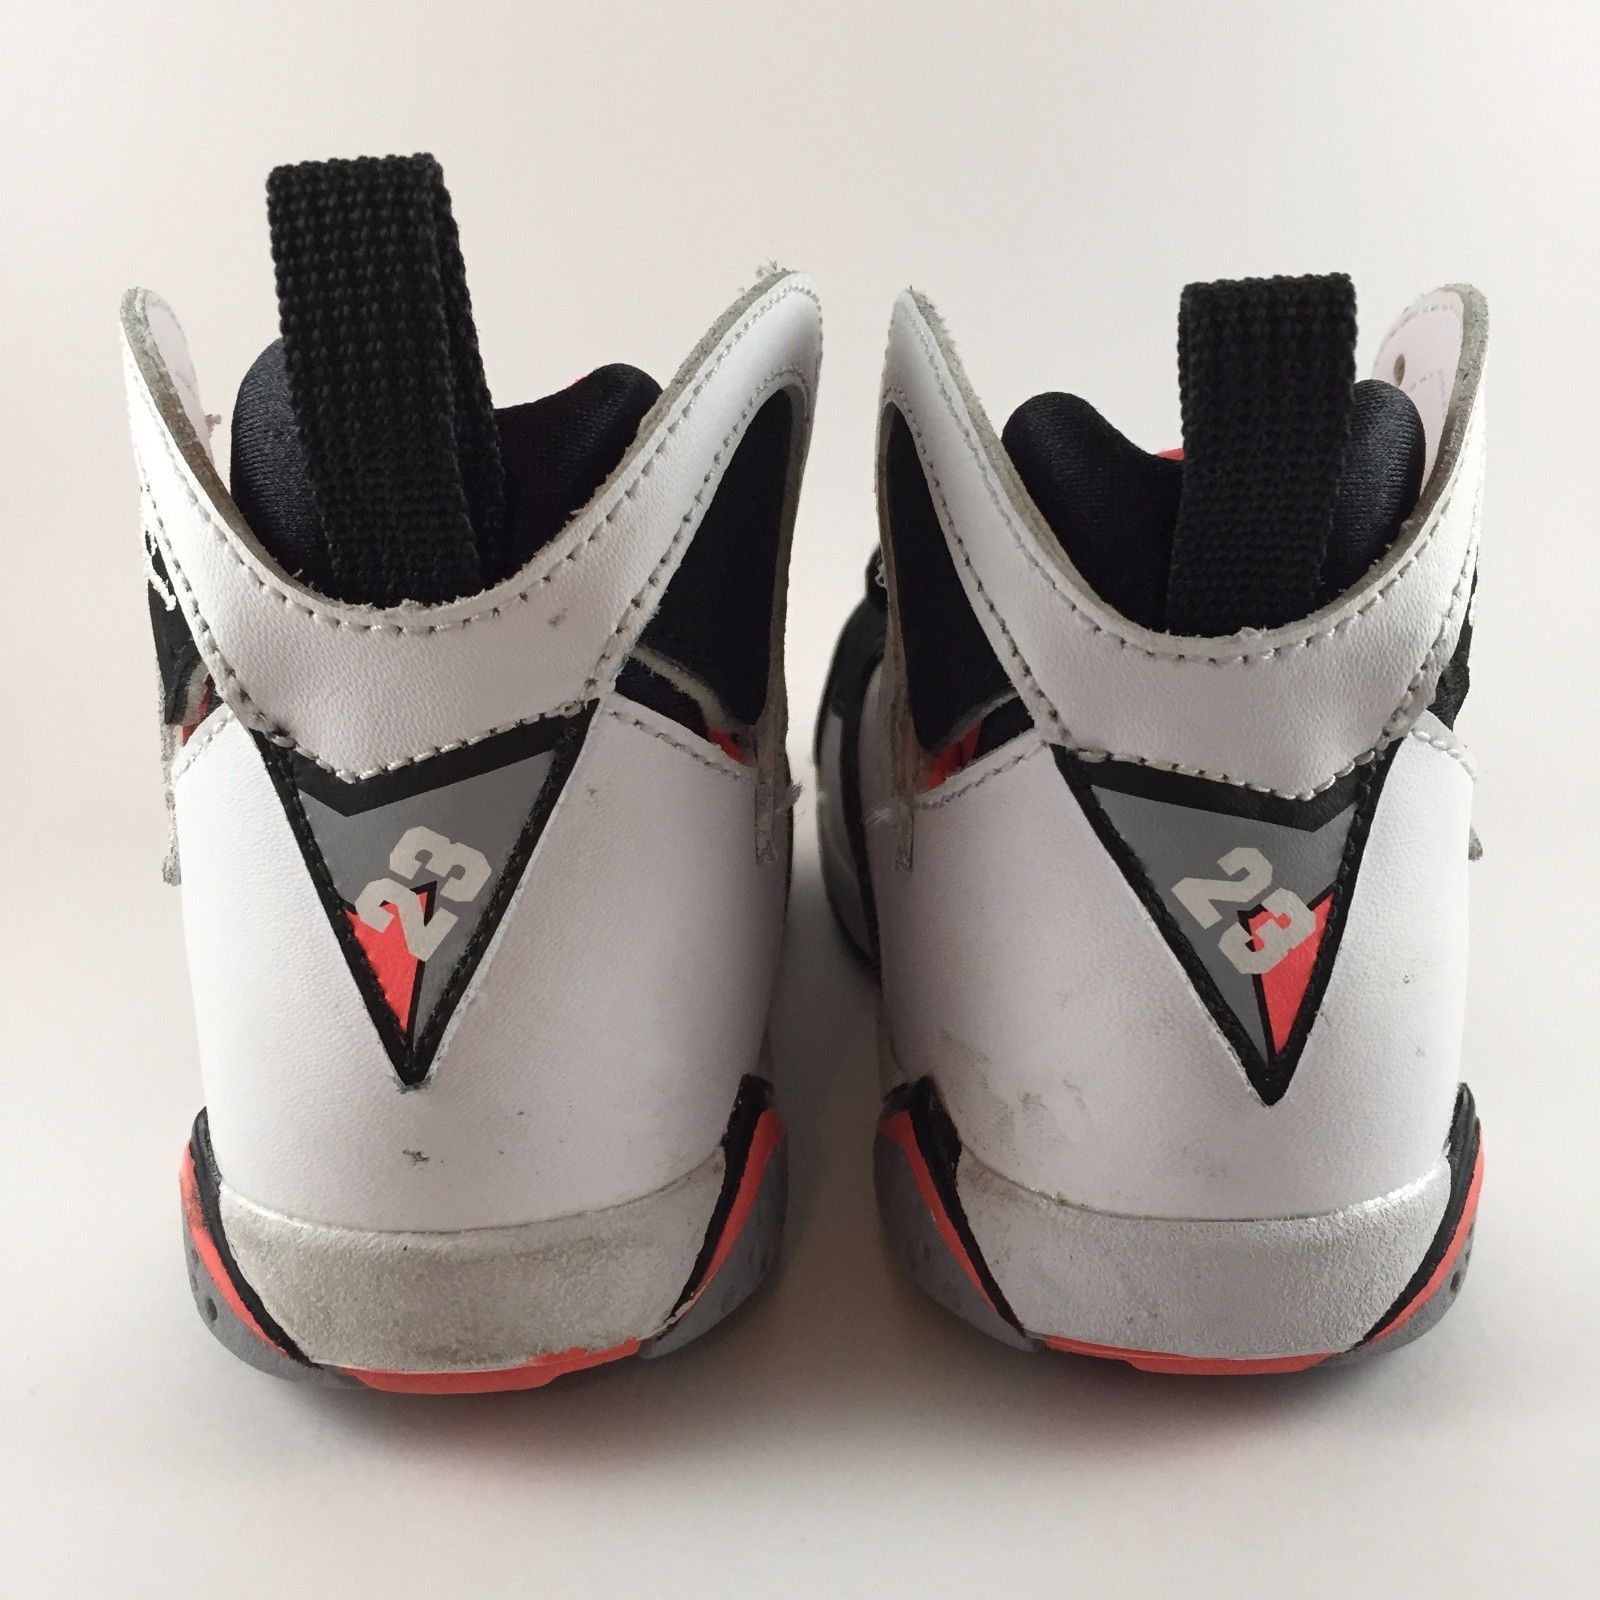 142019ad3cf5cf ... Nike Air Jordan Retro VII 7 Hot Lava White Black Orange Size 6C  705418-106 ...